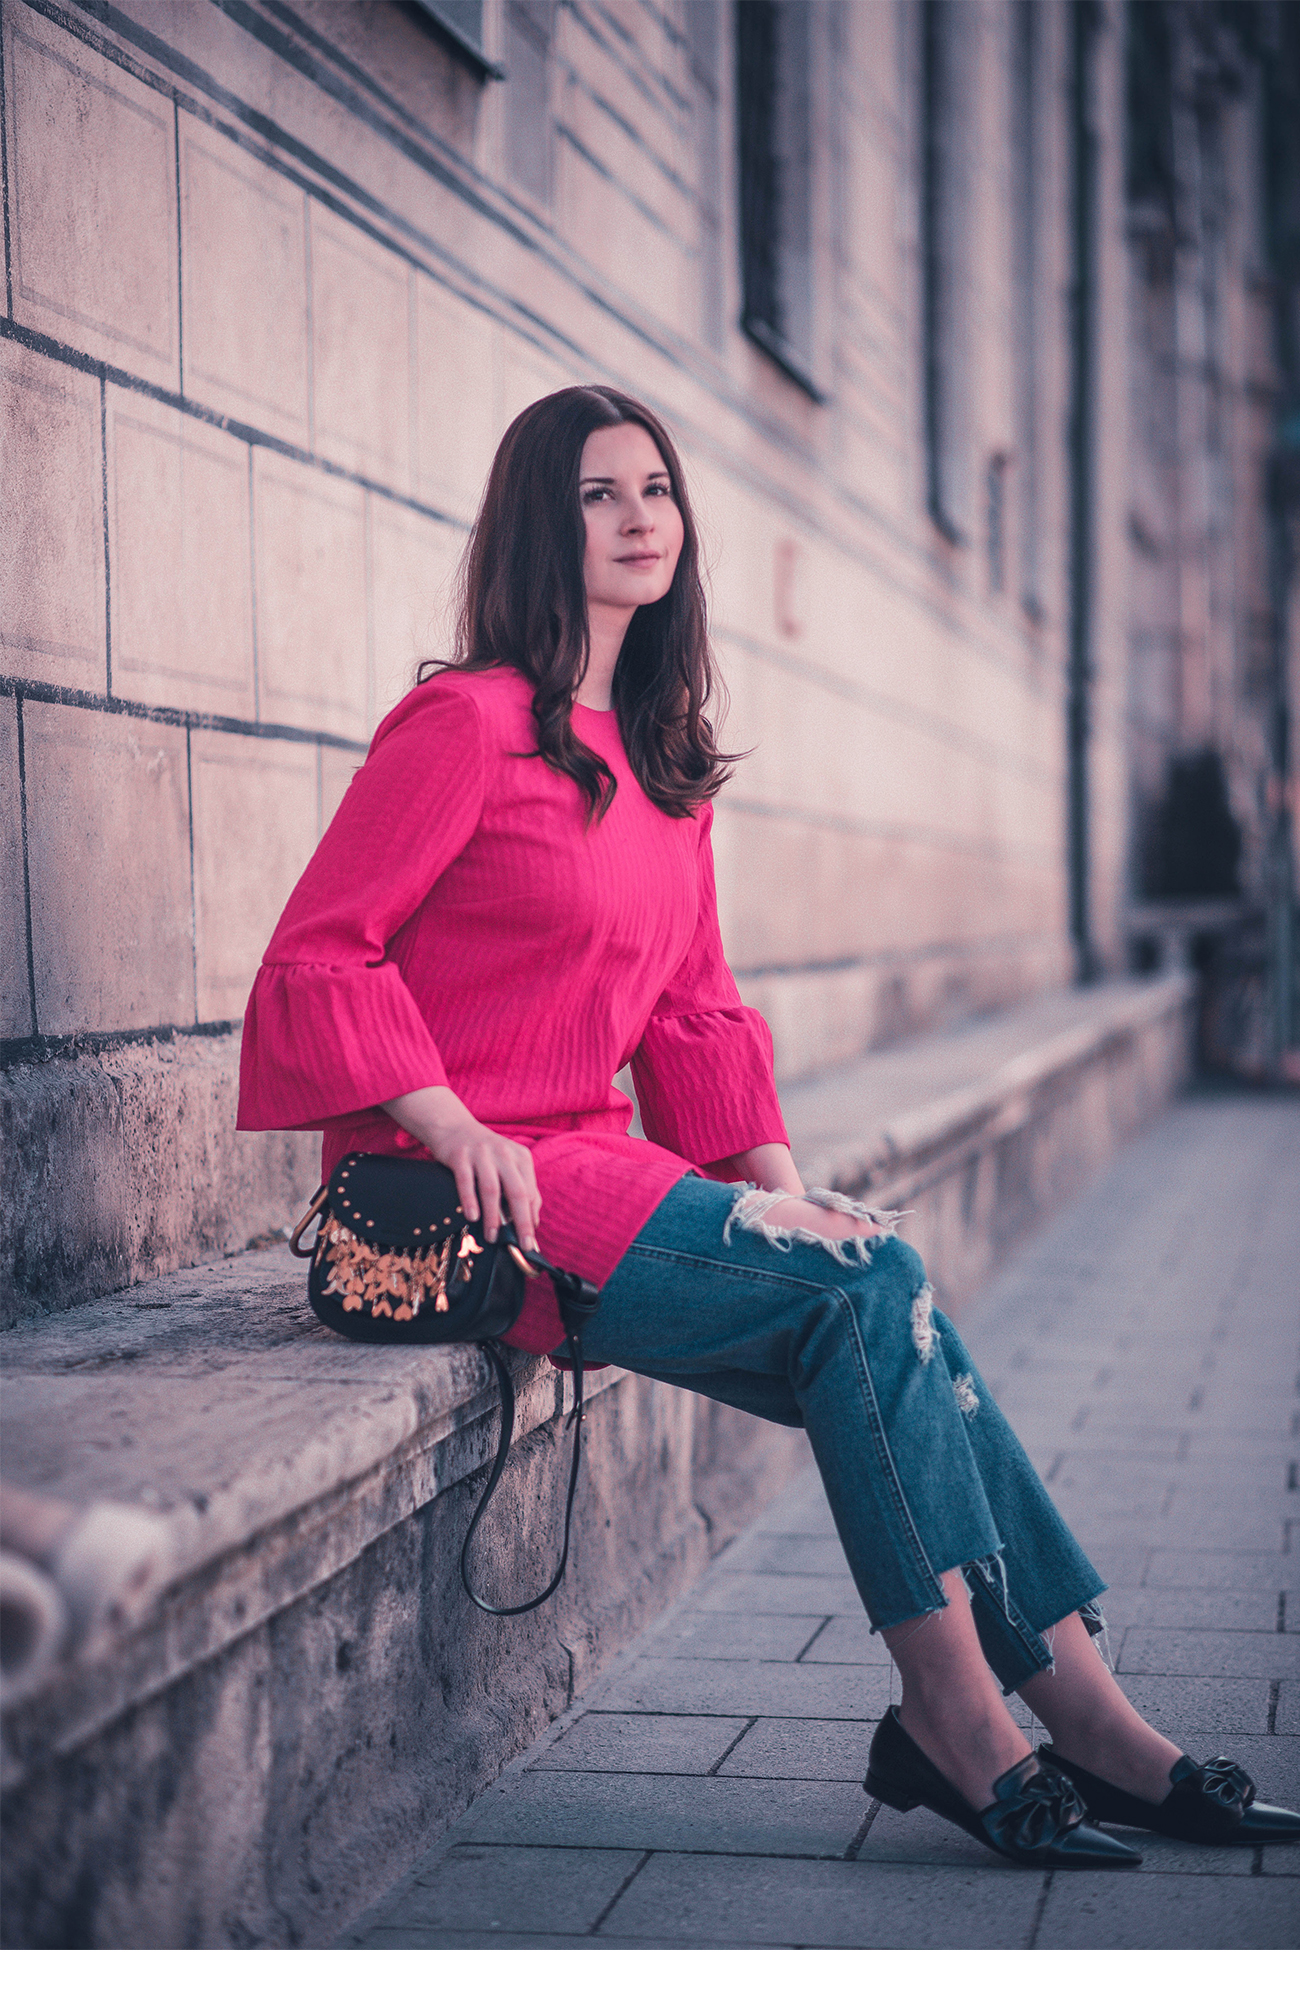 outfit chloe hudson pines klieg frühling fashion blog münchen